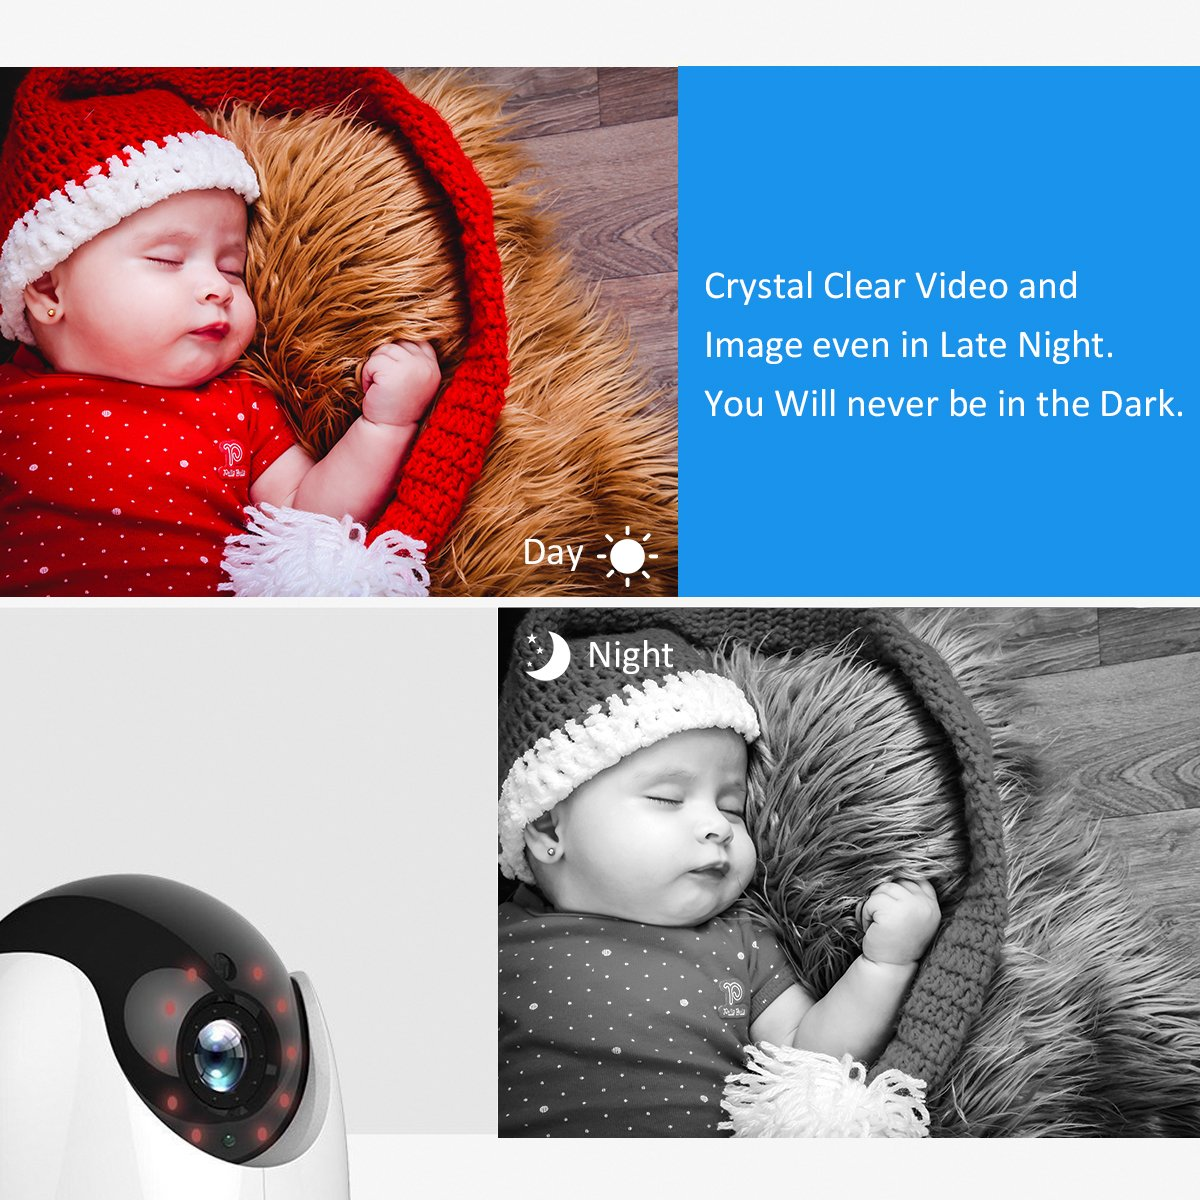 Amazon.com: Hogar inalámbrica cámara, 1080p, WiFi IP ...